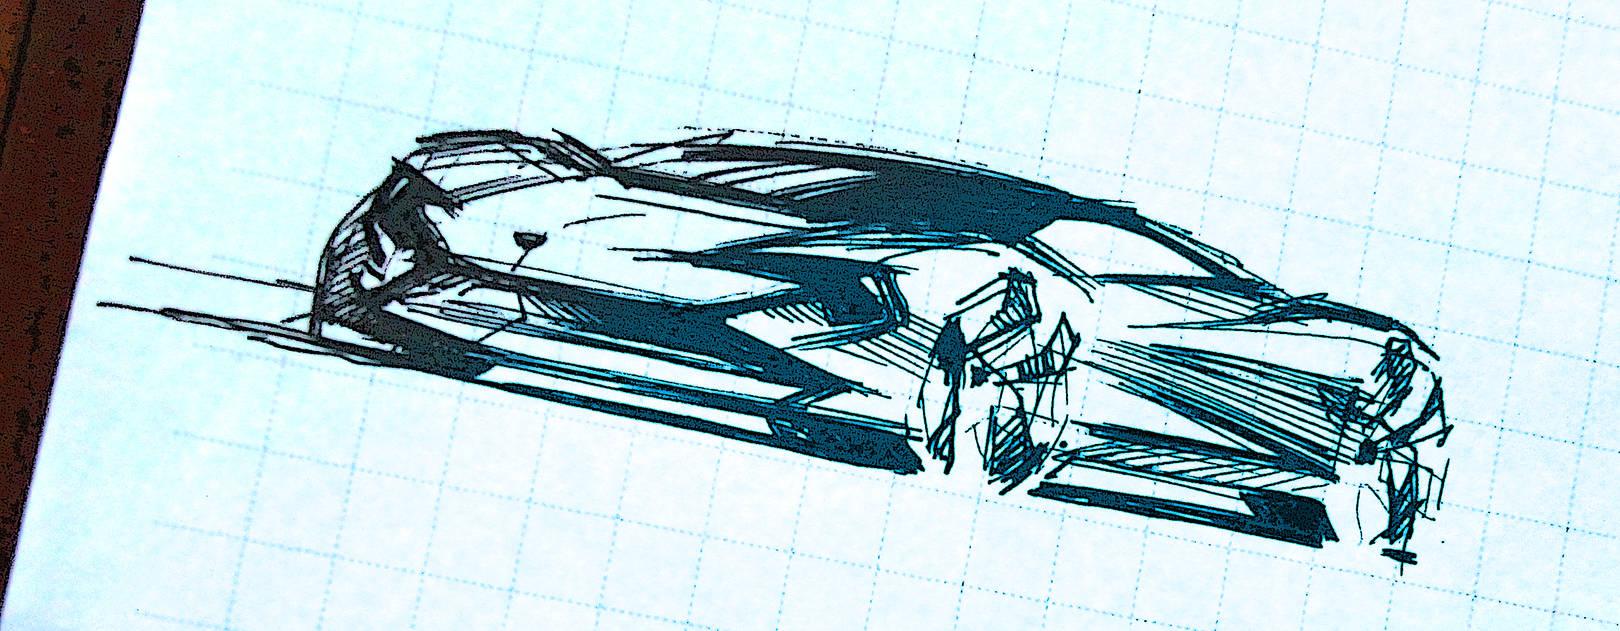 Quick sketch#1